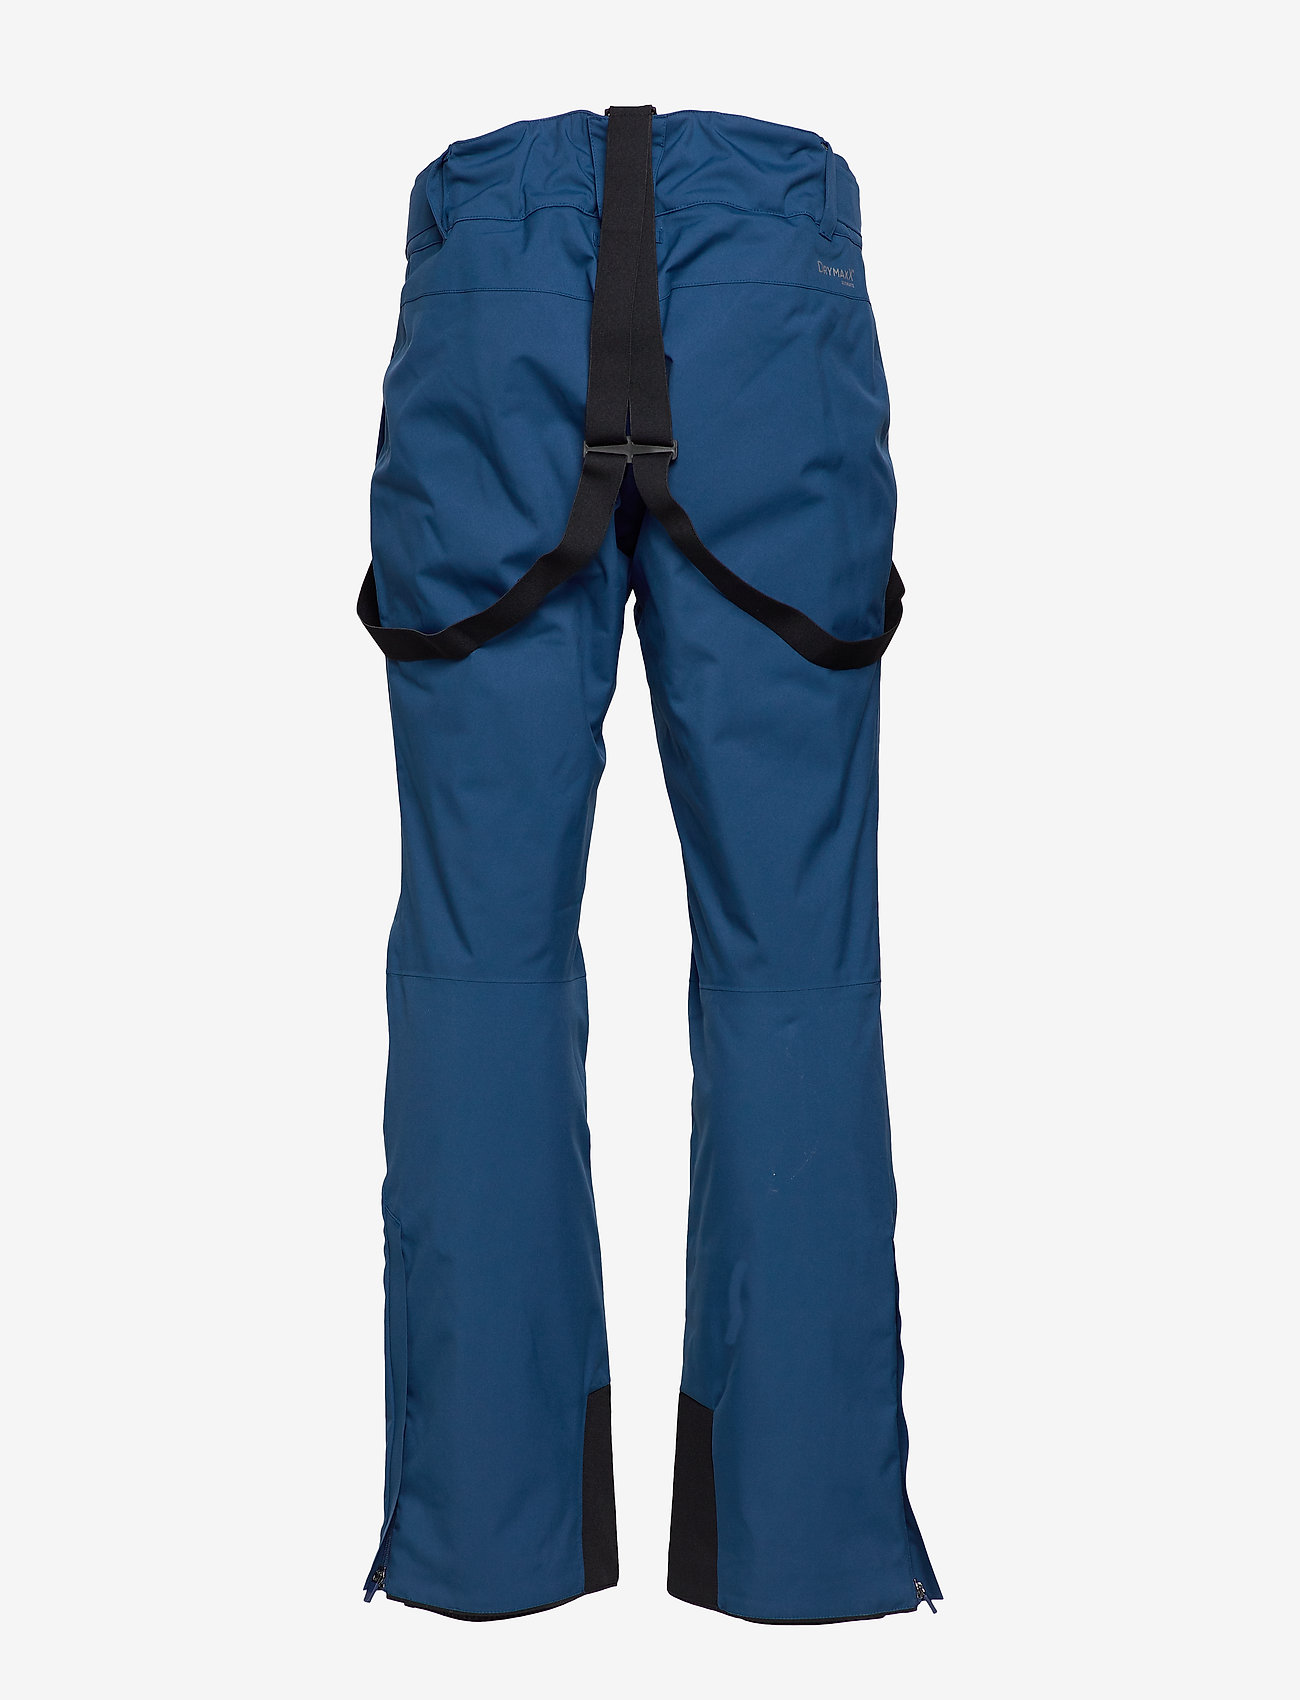 Halti - Puntti Men's DX Ski Pants - insulated pantsinsulated pants - blue opal - 1